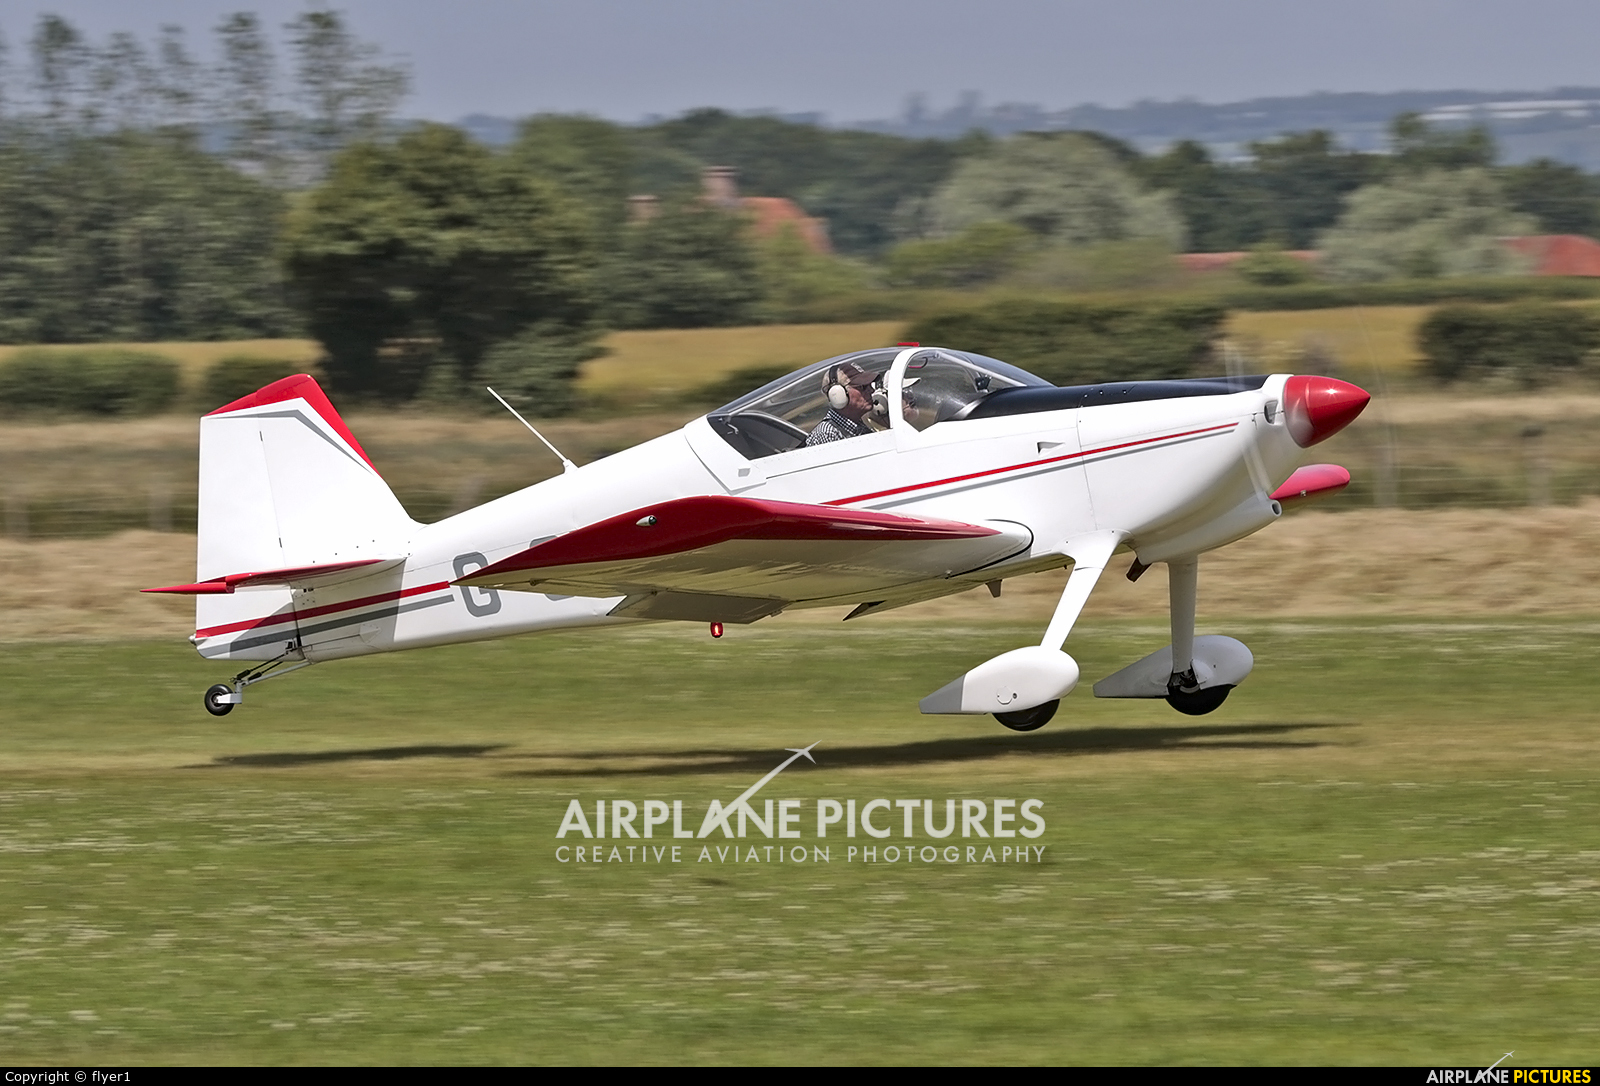 Private G-CHFG aircraft at Lashenden / Headcorn